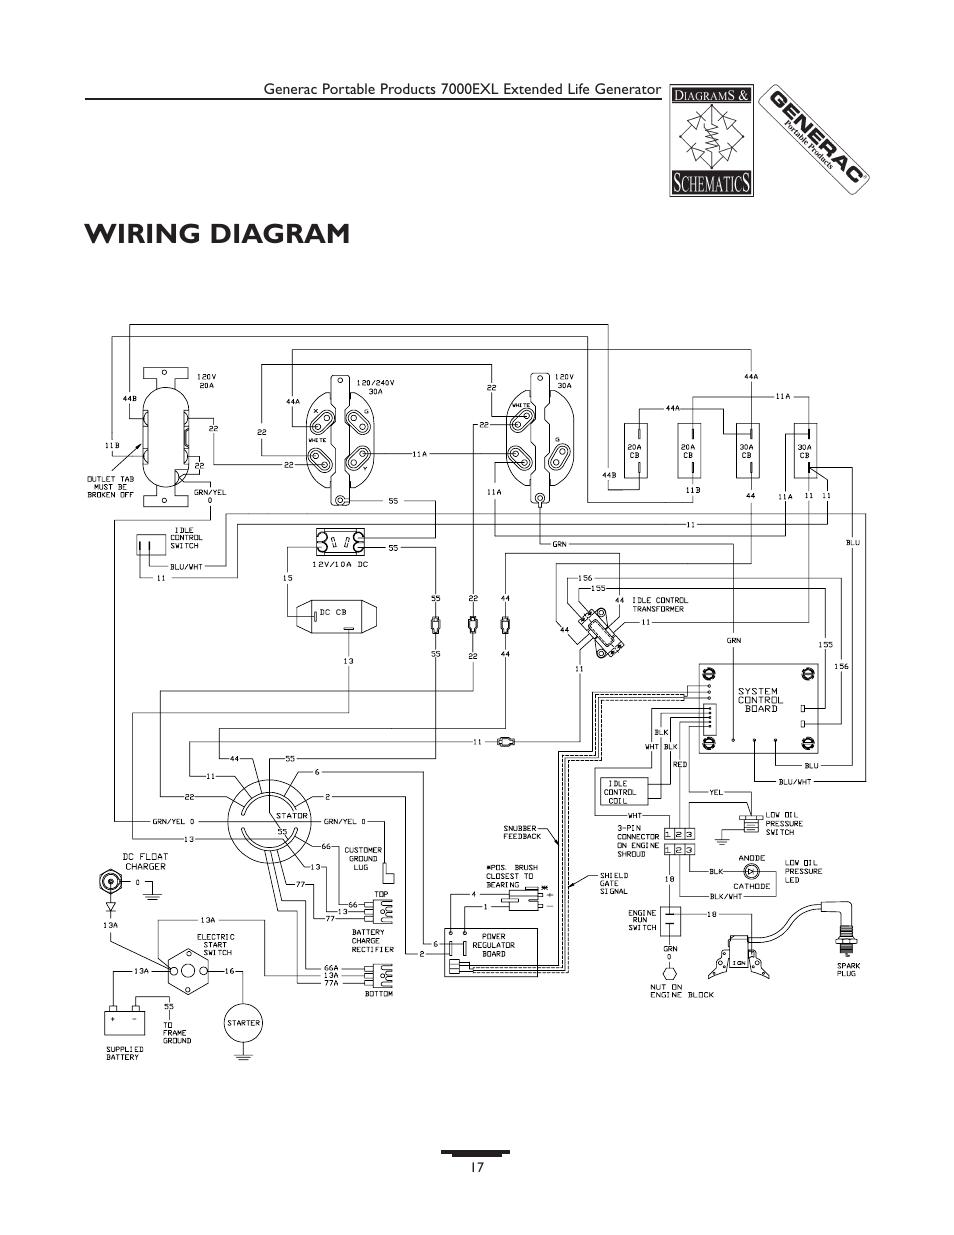 hight resolution of wiring diagram pioneer deh p4000ub uc xs wiring diagram pioneer deh p4000ub uc xs